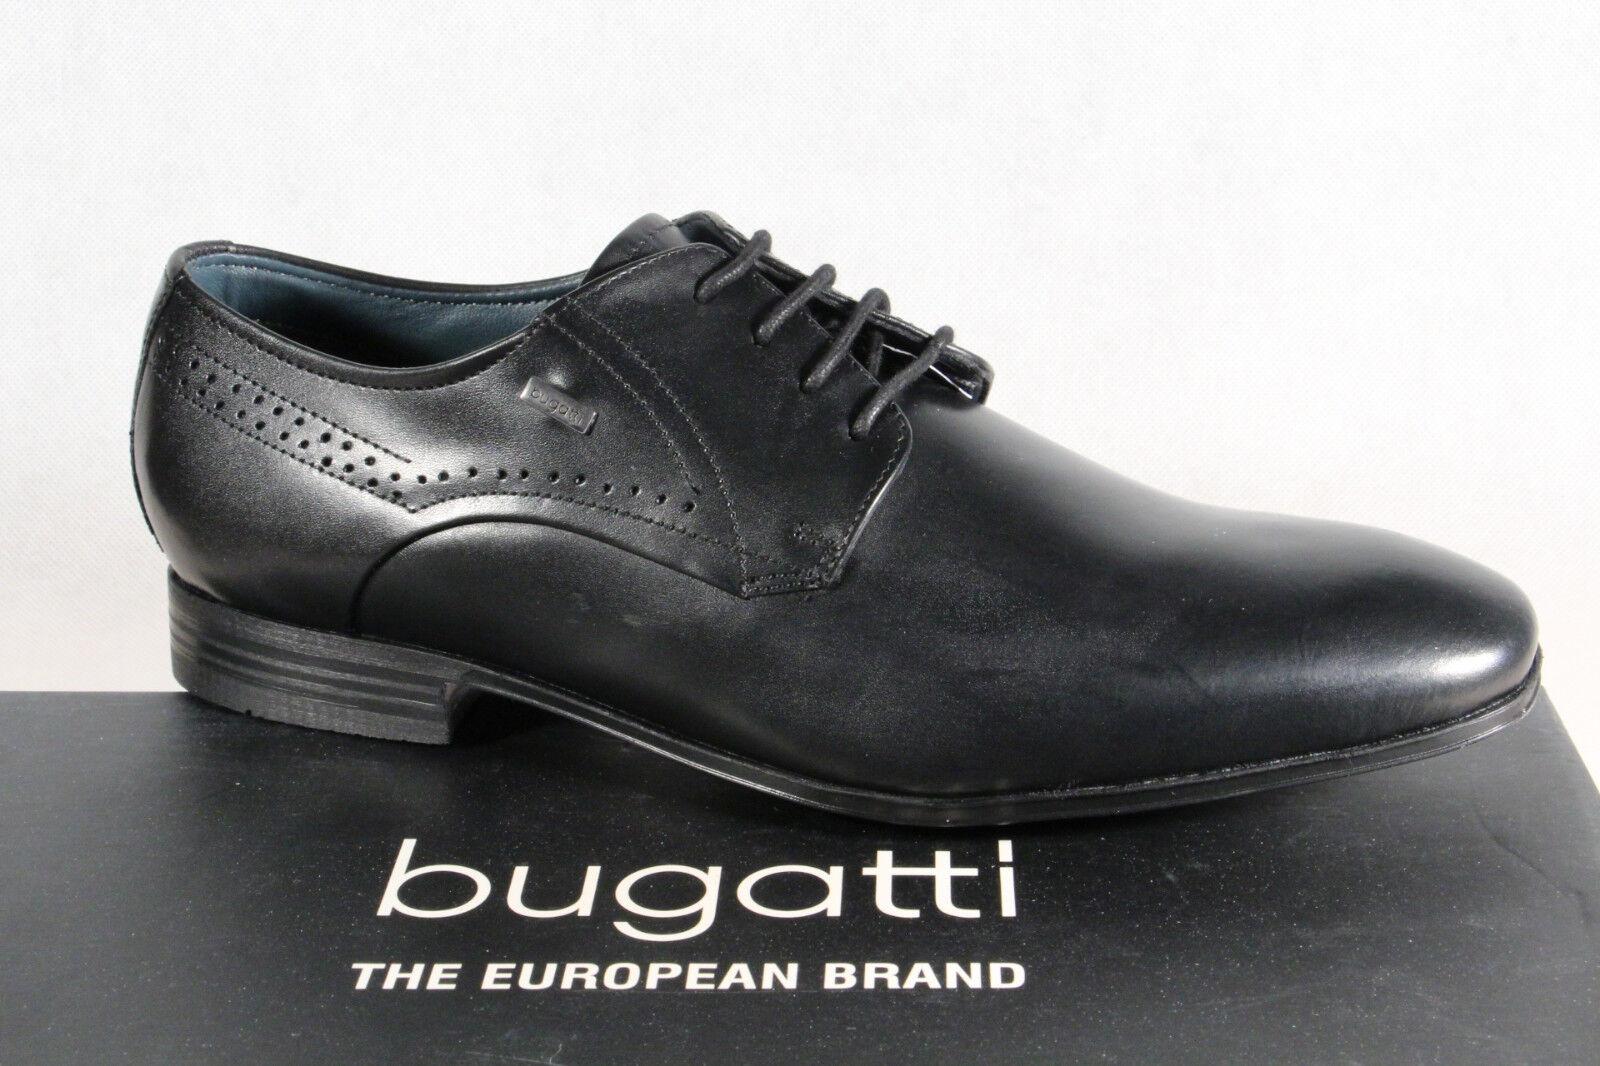 Bugatti Herren Schnürschuh Schnürschuhe Halbschuhe Sneaker schwarz NEU!